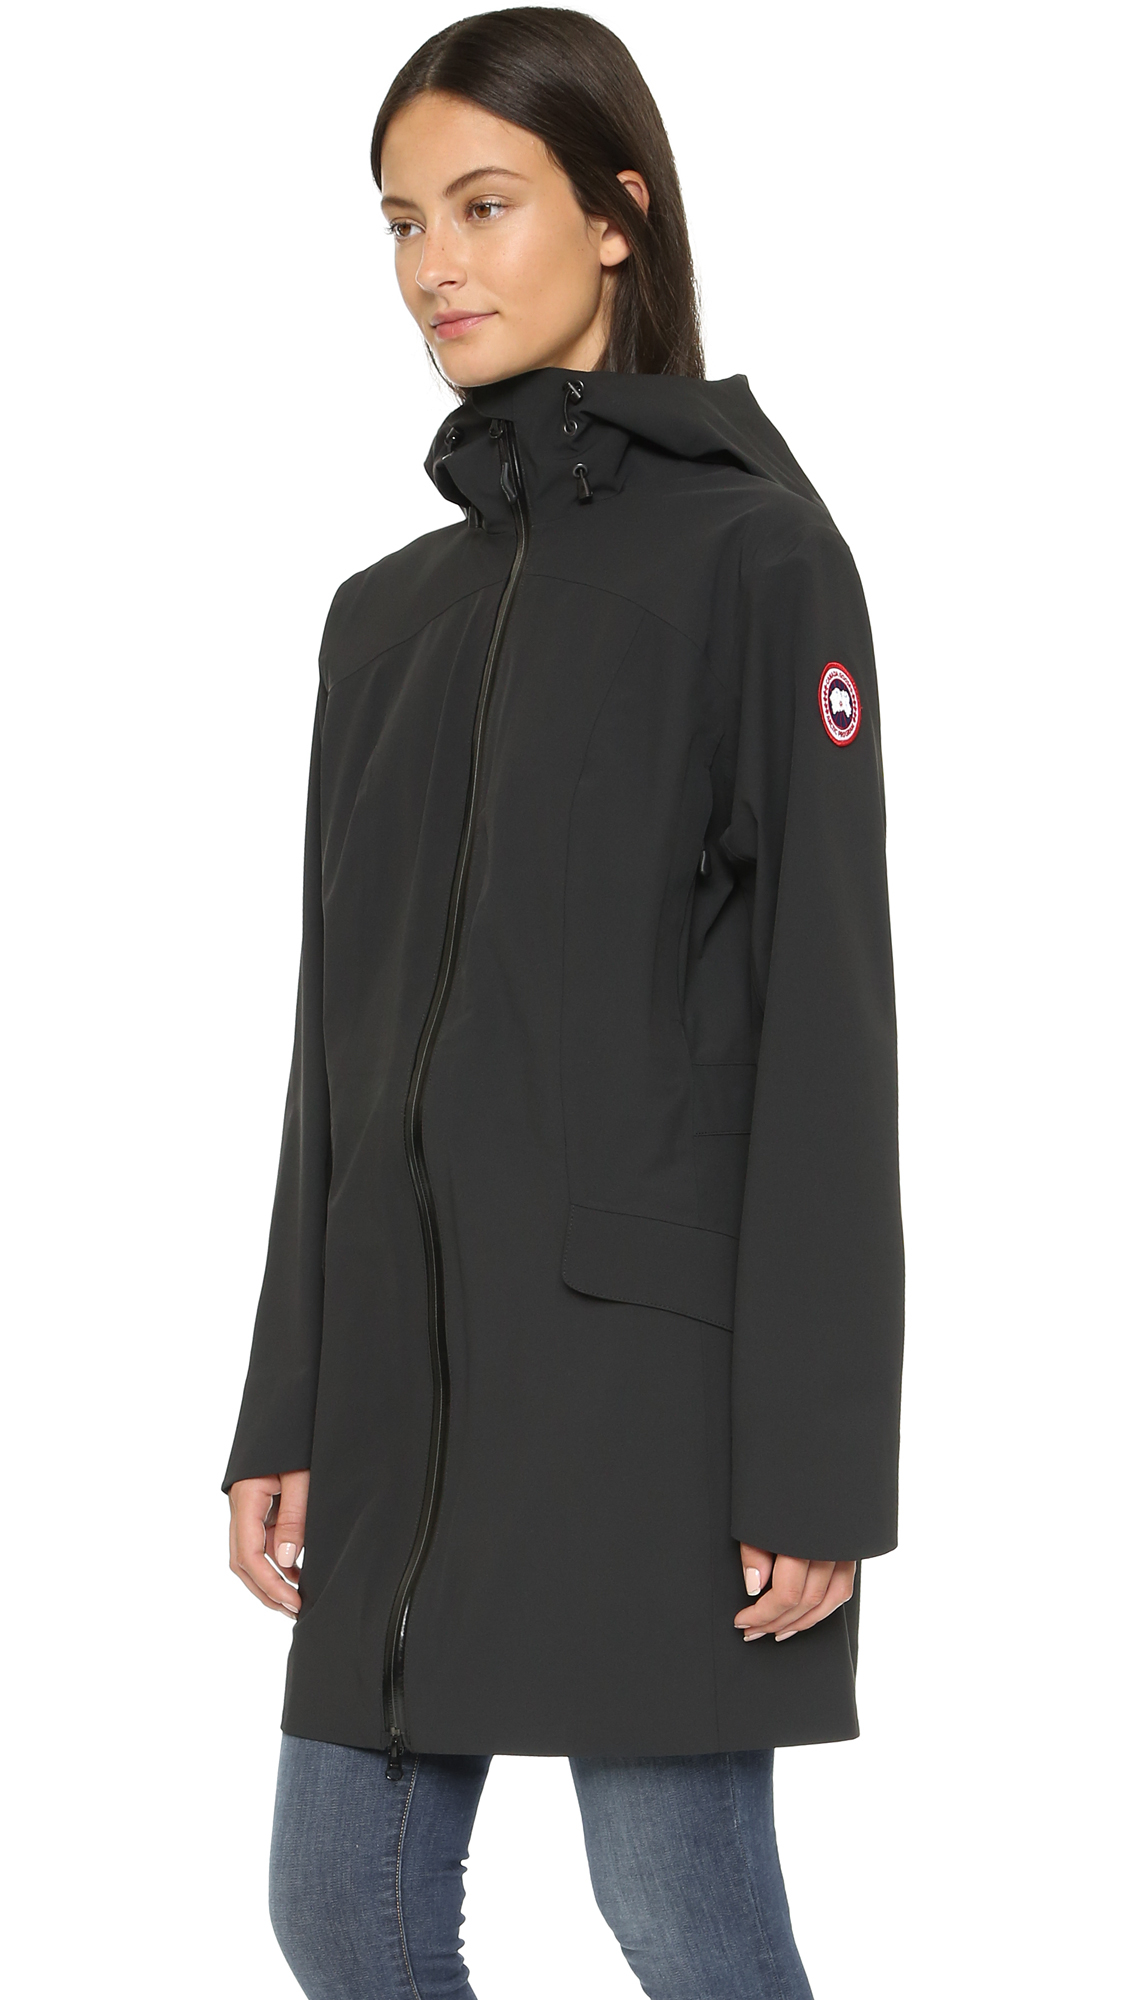 Womens jackets online canada